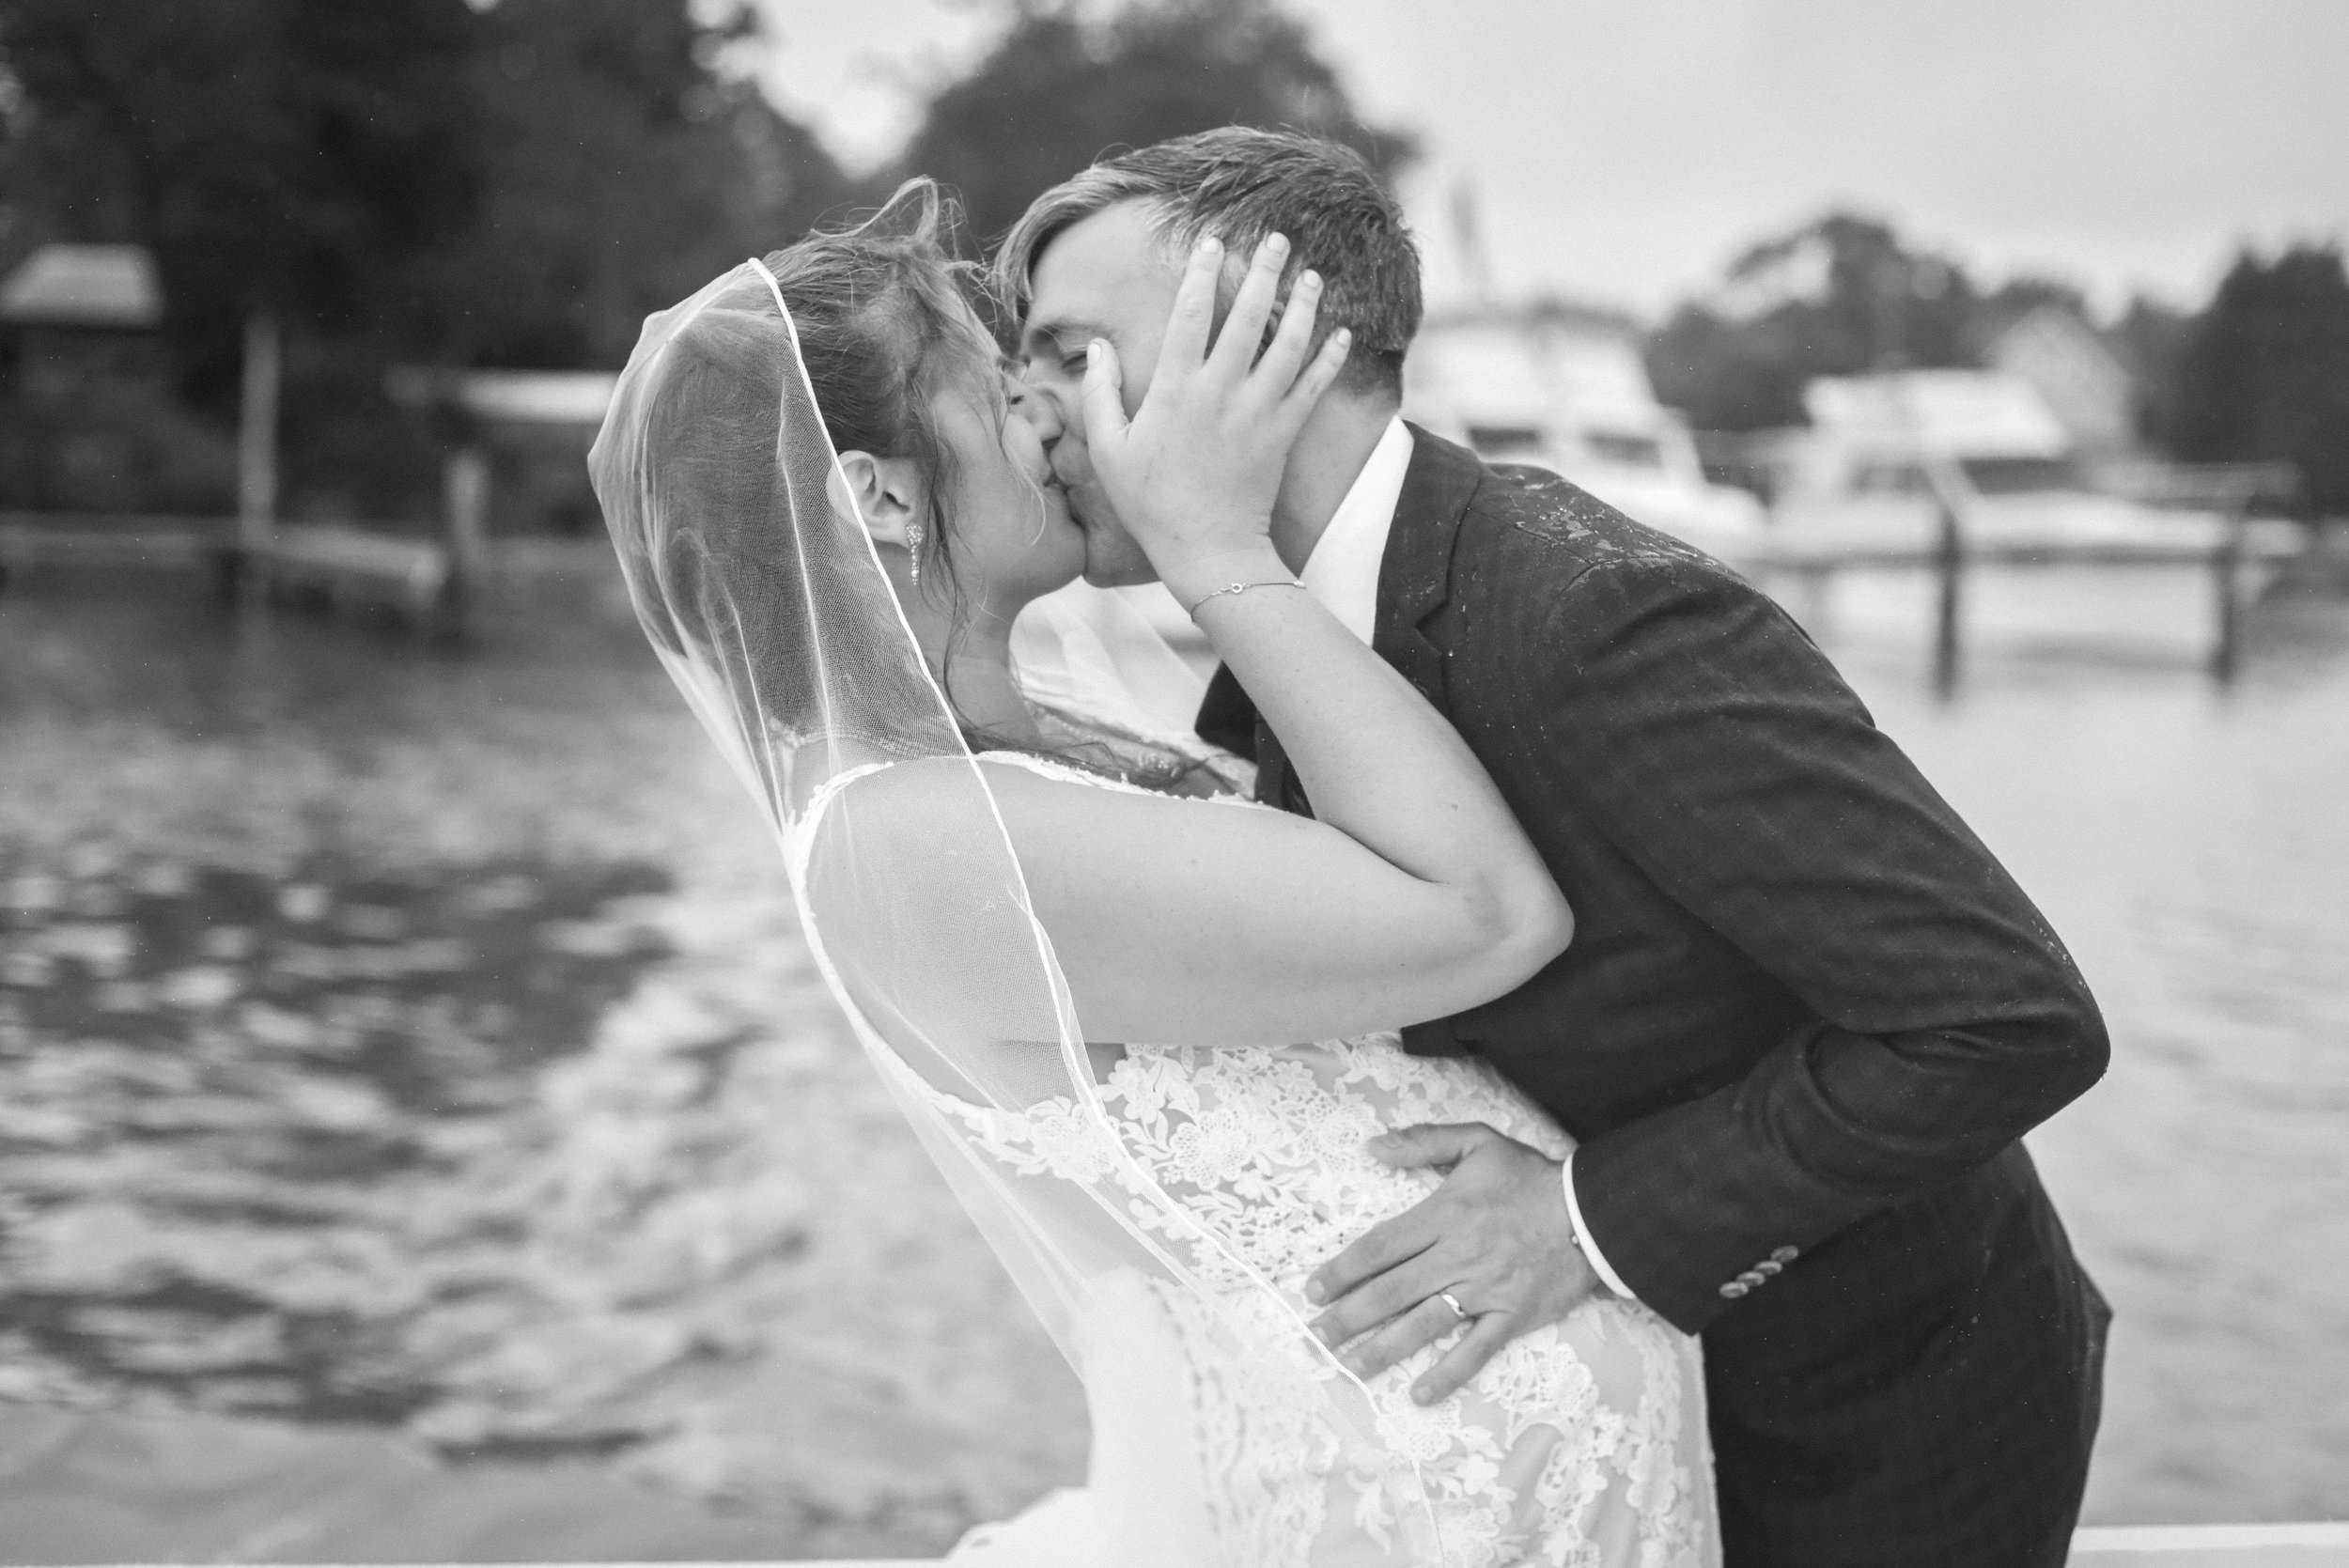 happy_harbor_deale_wedding_sneak_peek-8.jpg